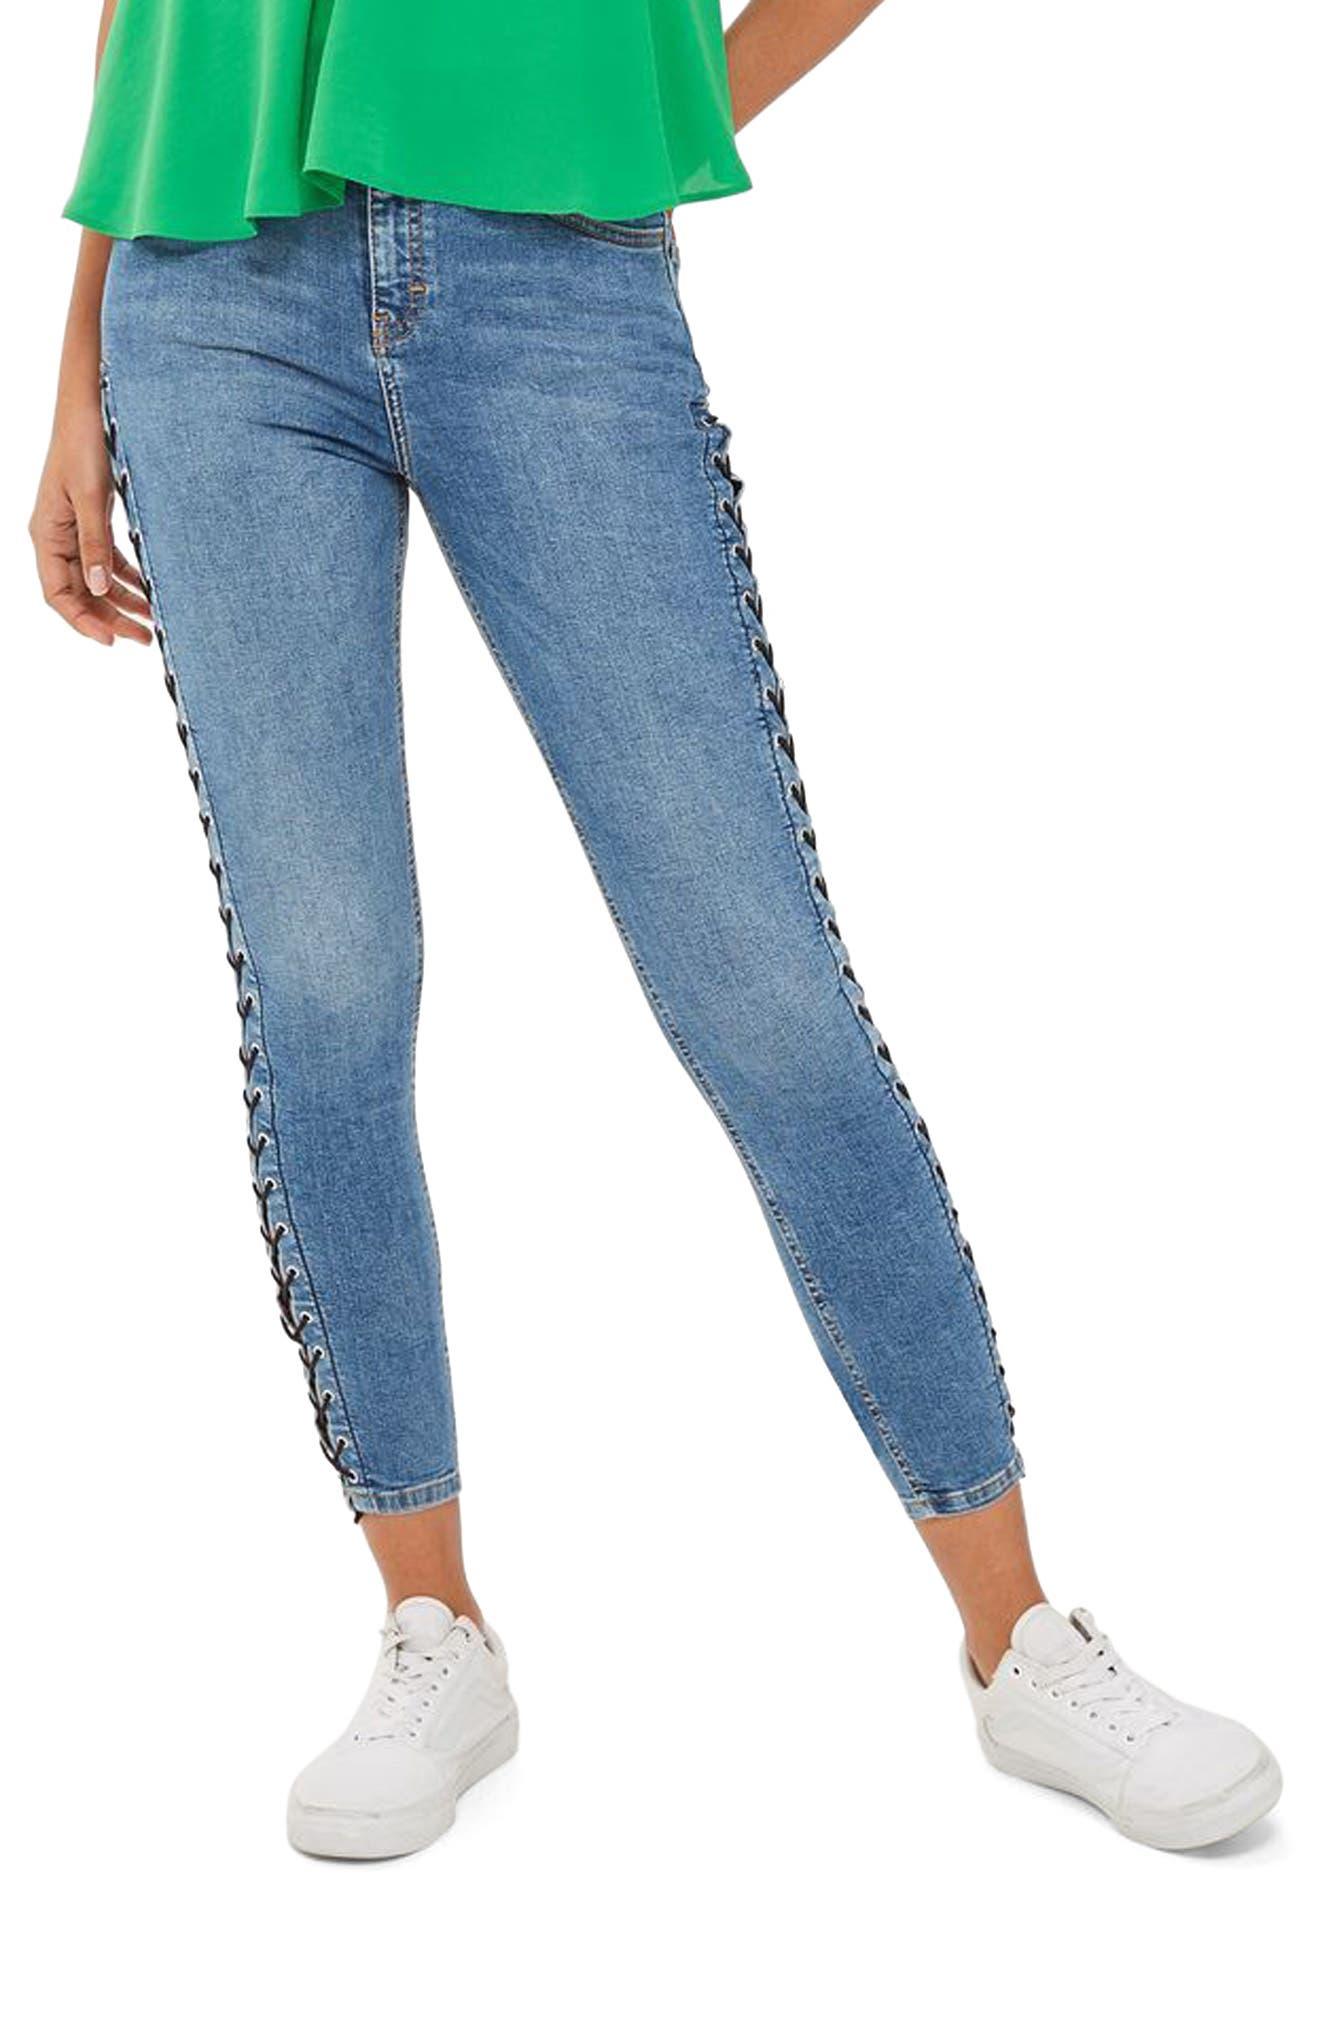 Topshop Jamie Side Lace-Up Ankle Skinny Jeans (Regular & Petite)